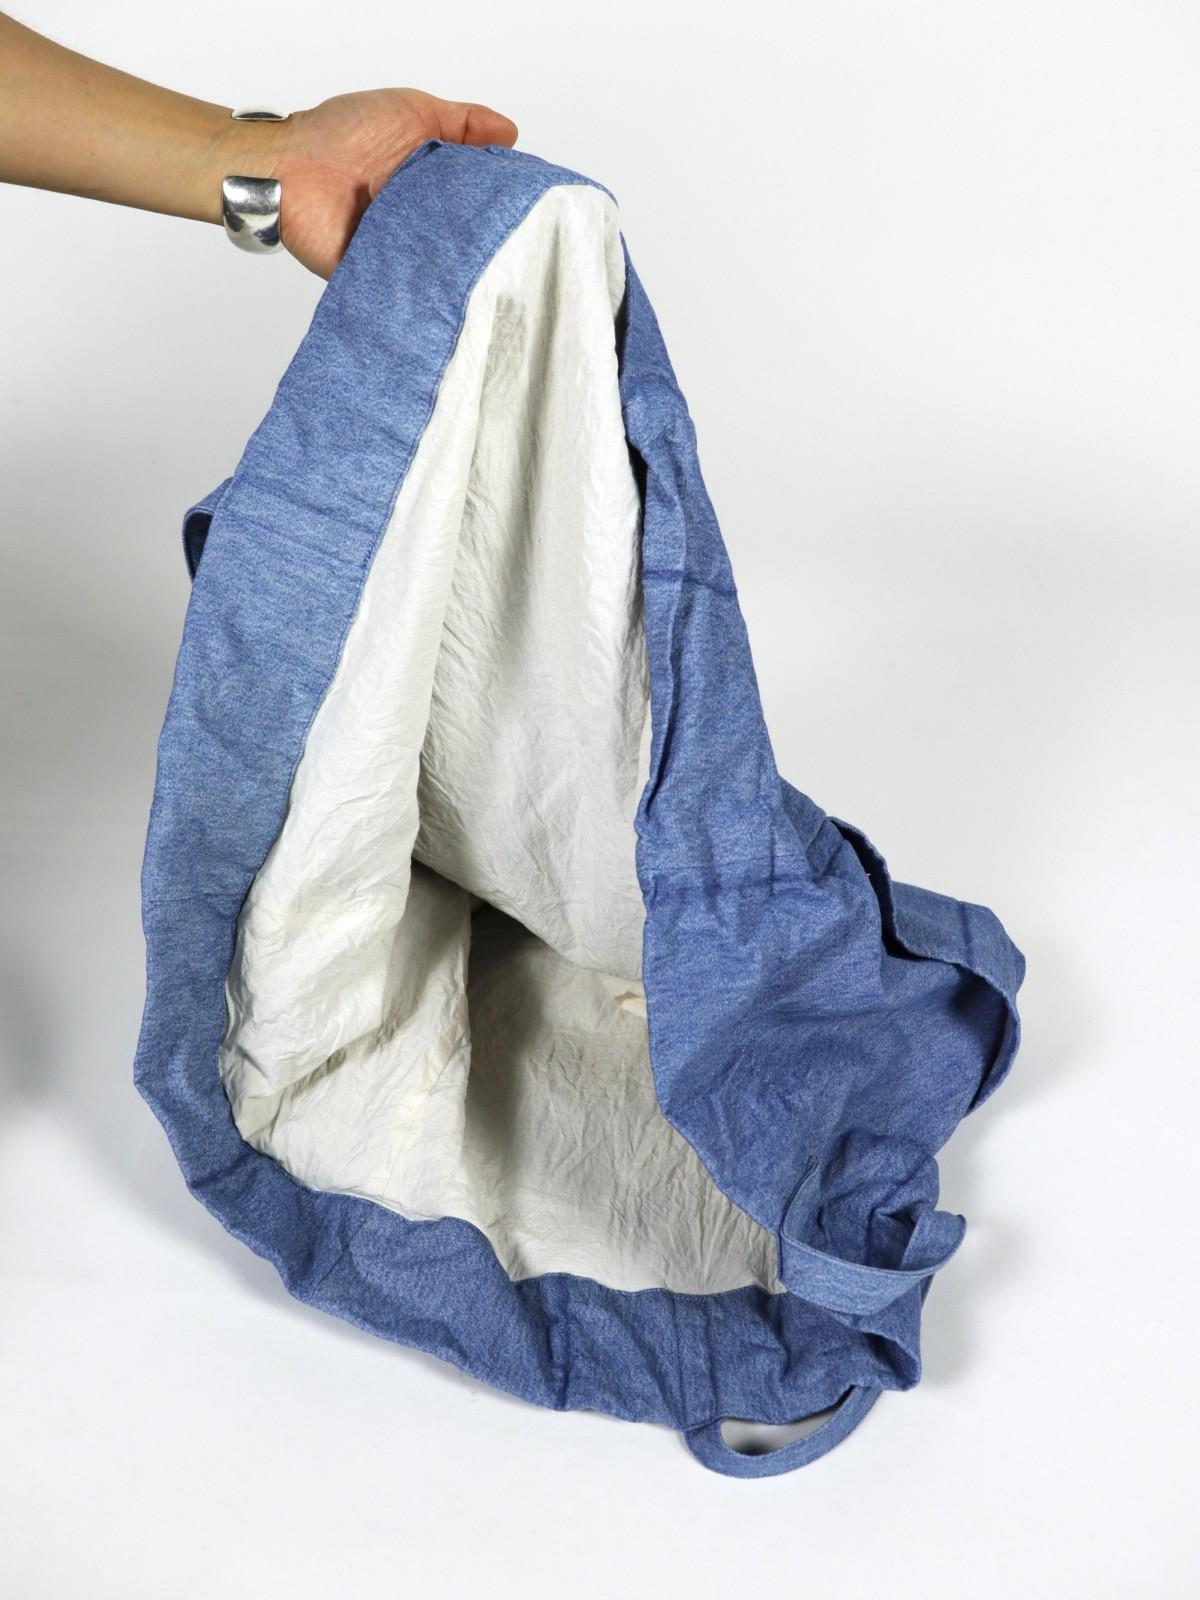 ralph lauren, denim fabric, brown.remake, bag